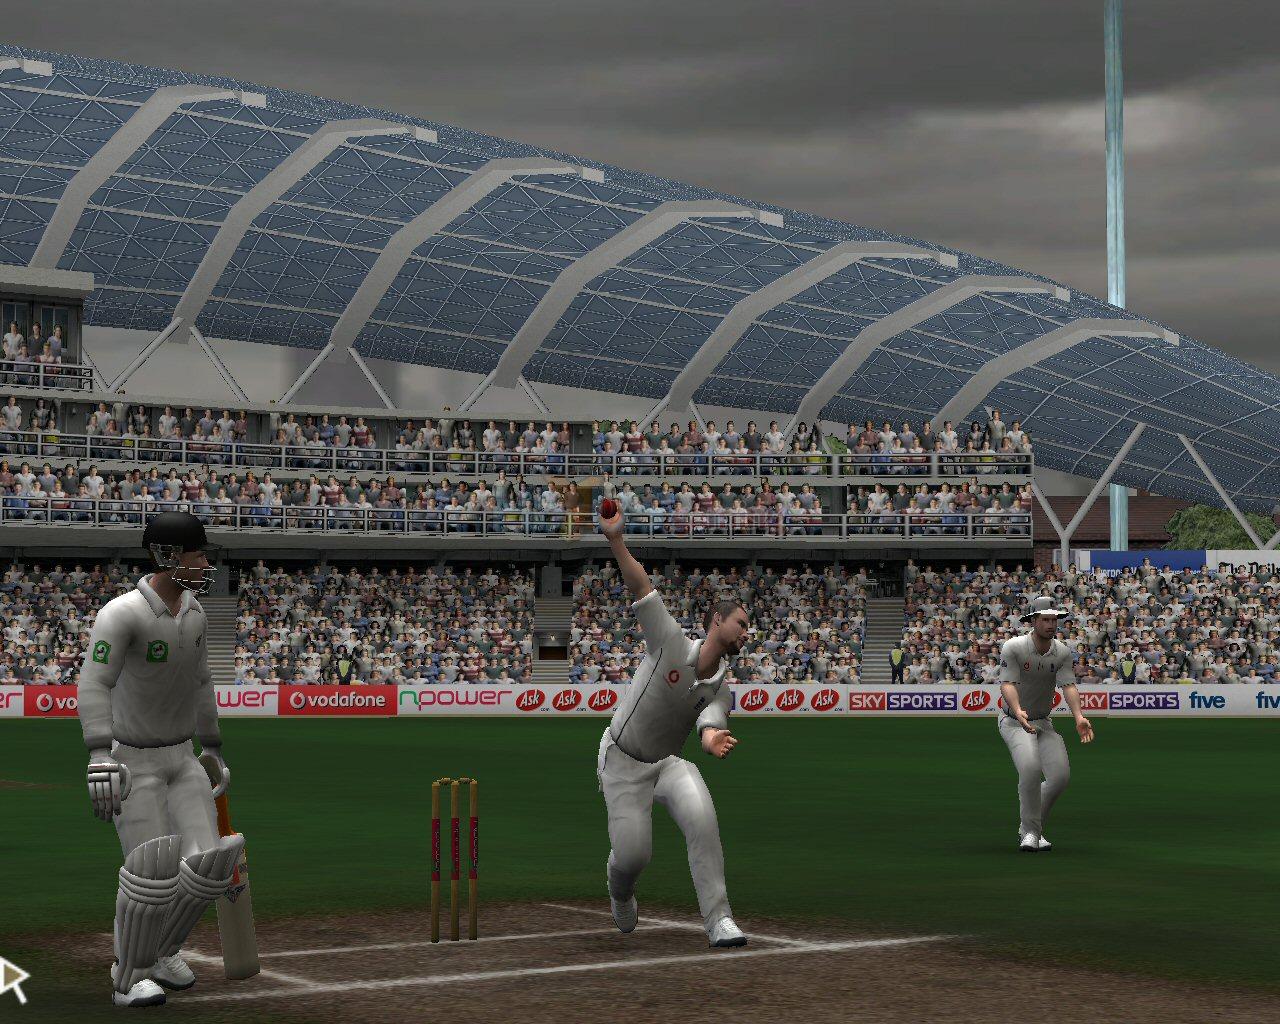 Ea cricket 2004 cheats